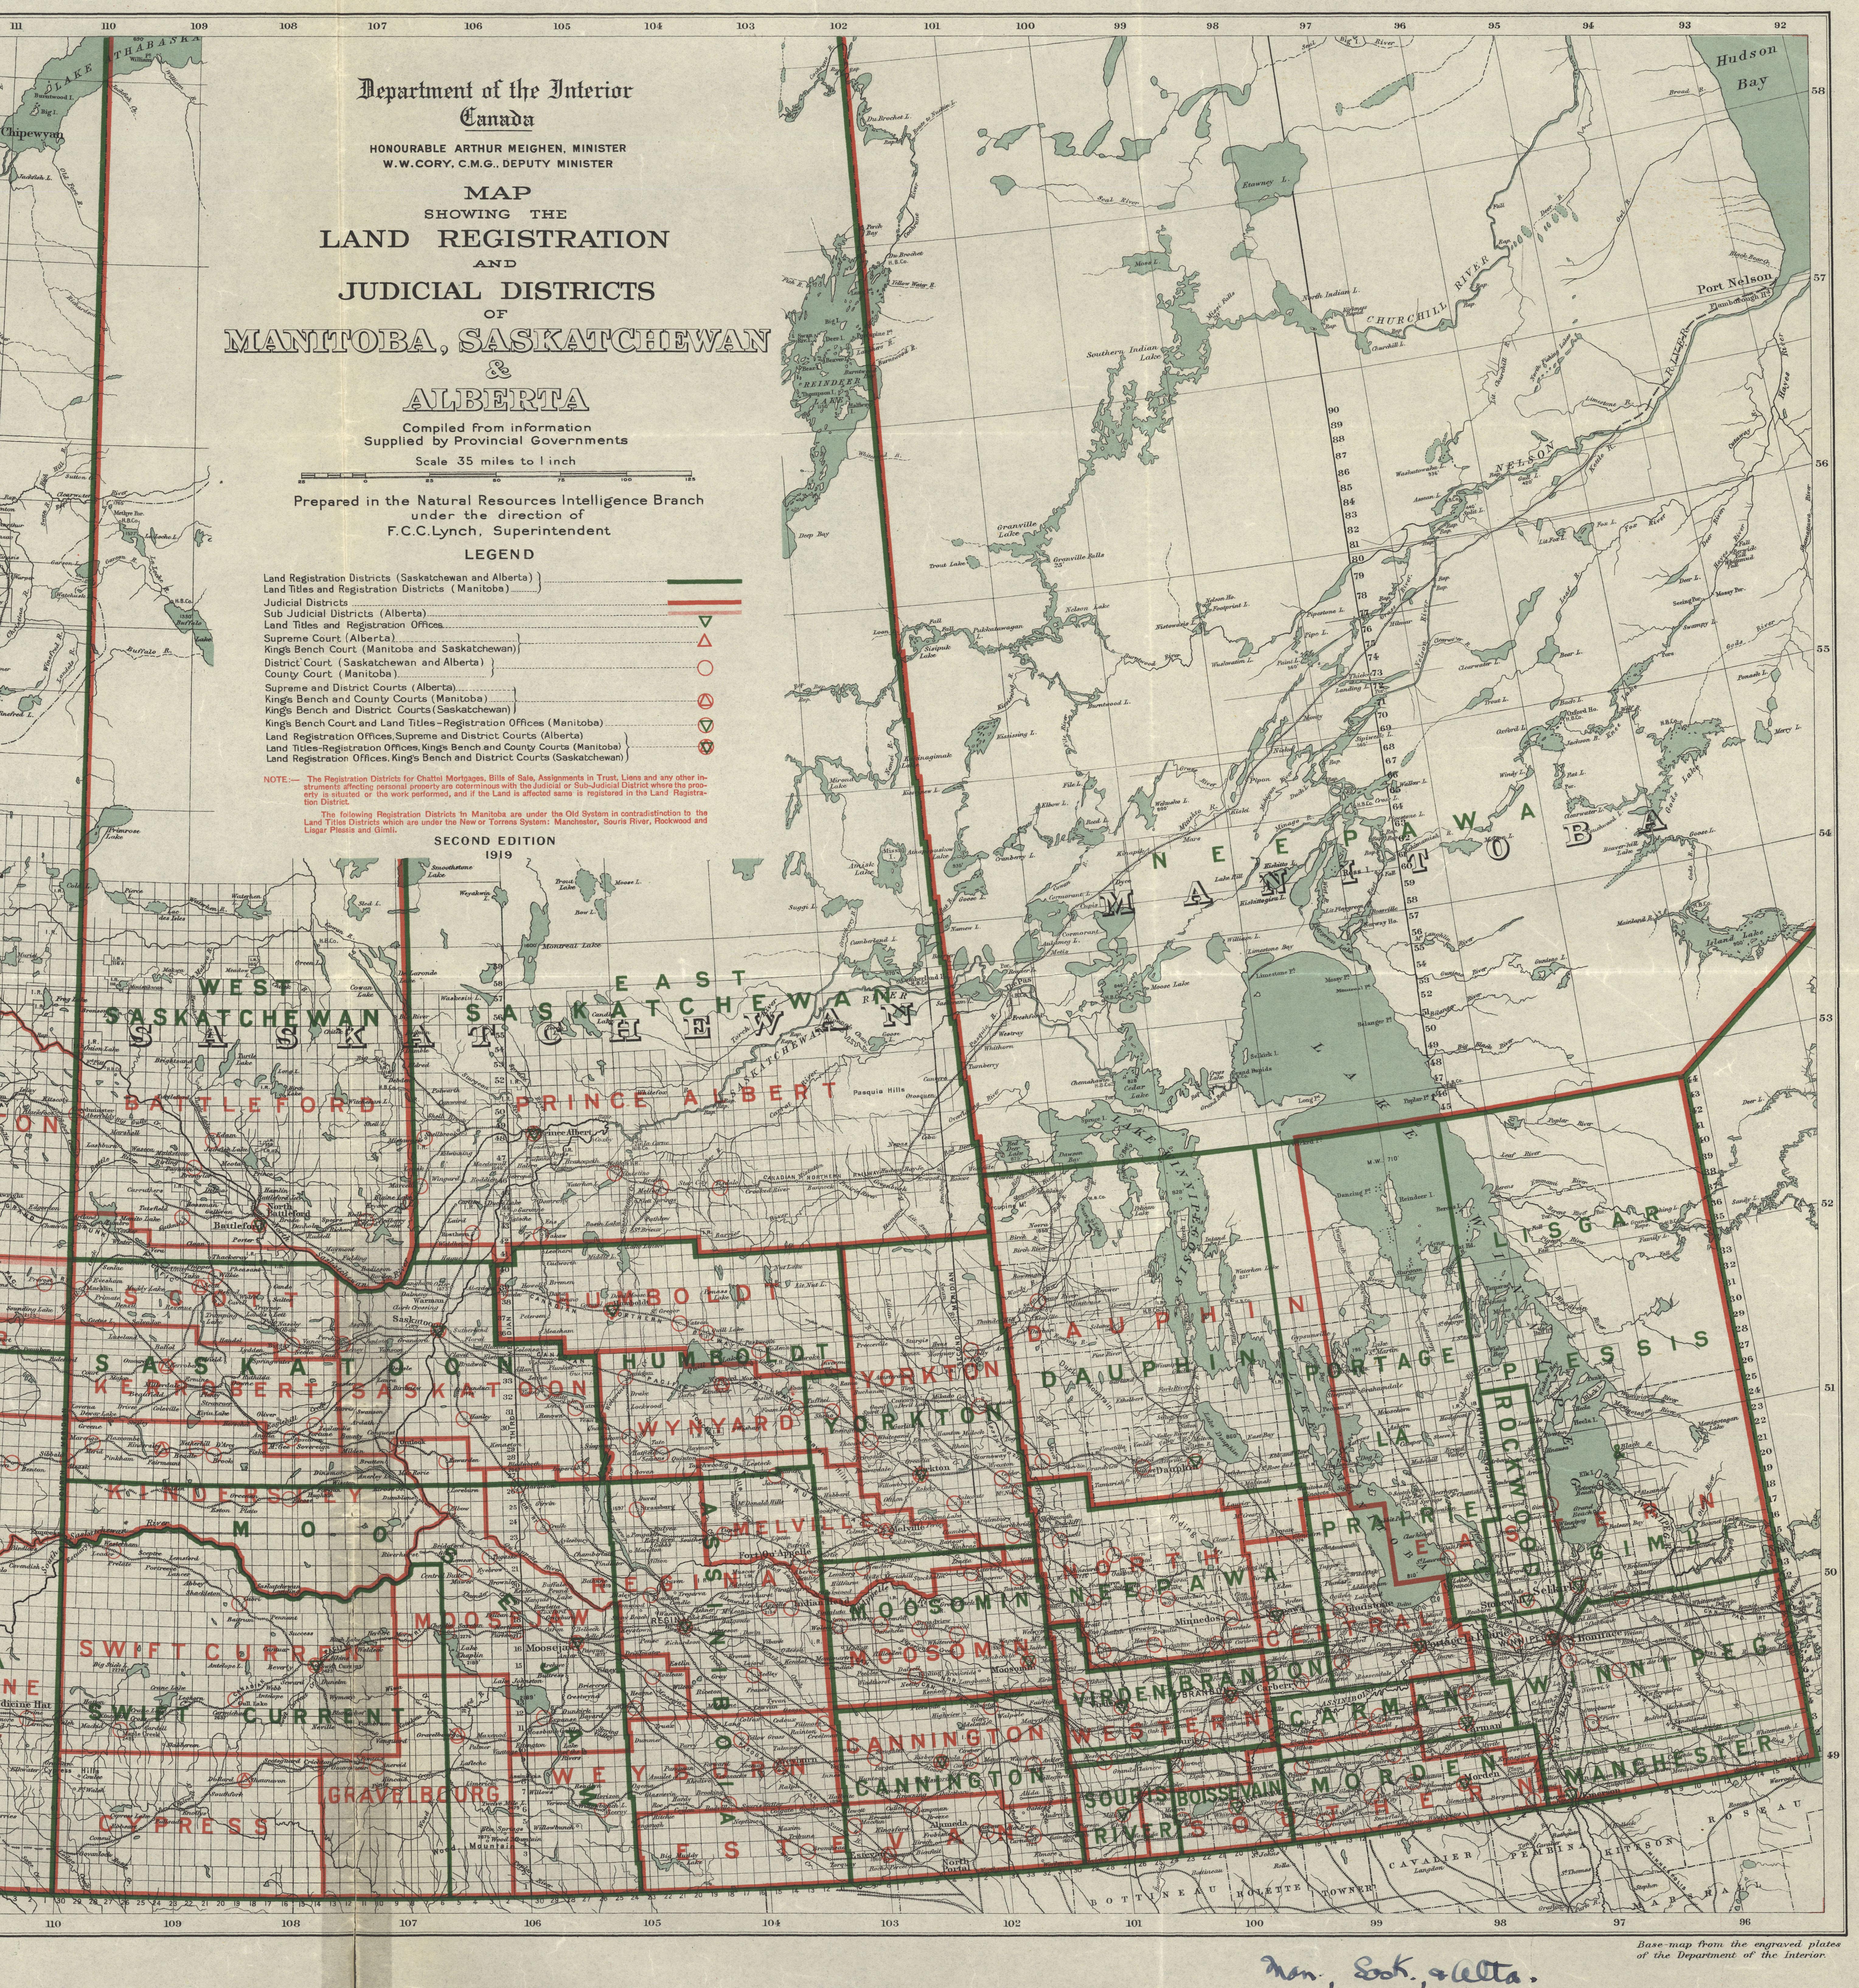 Saskatchewan Natural Resources Department